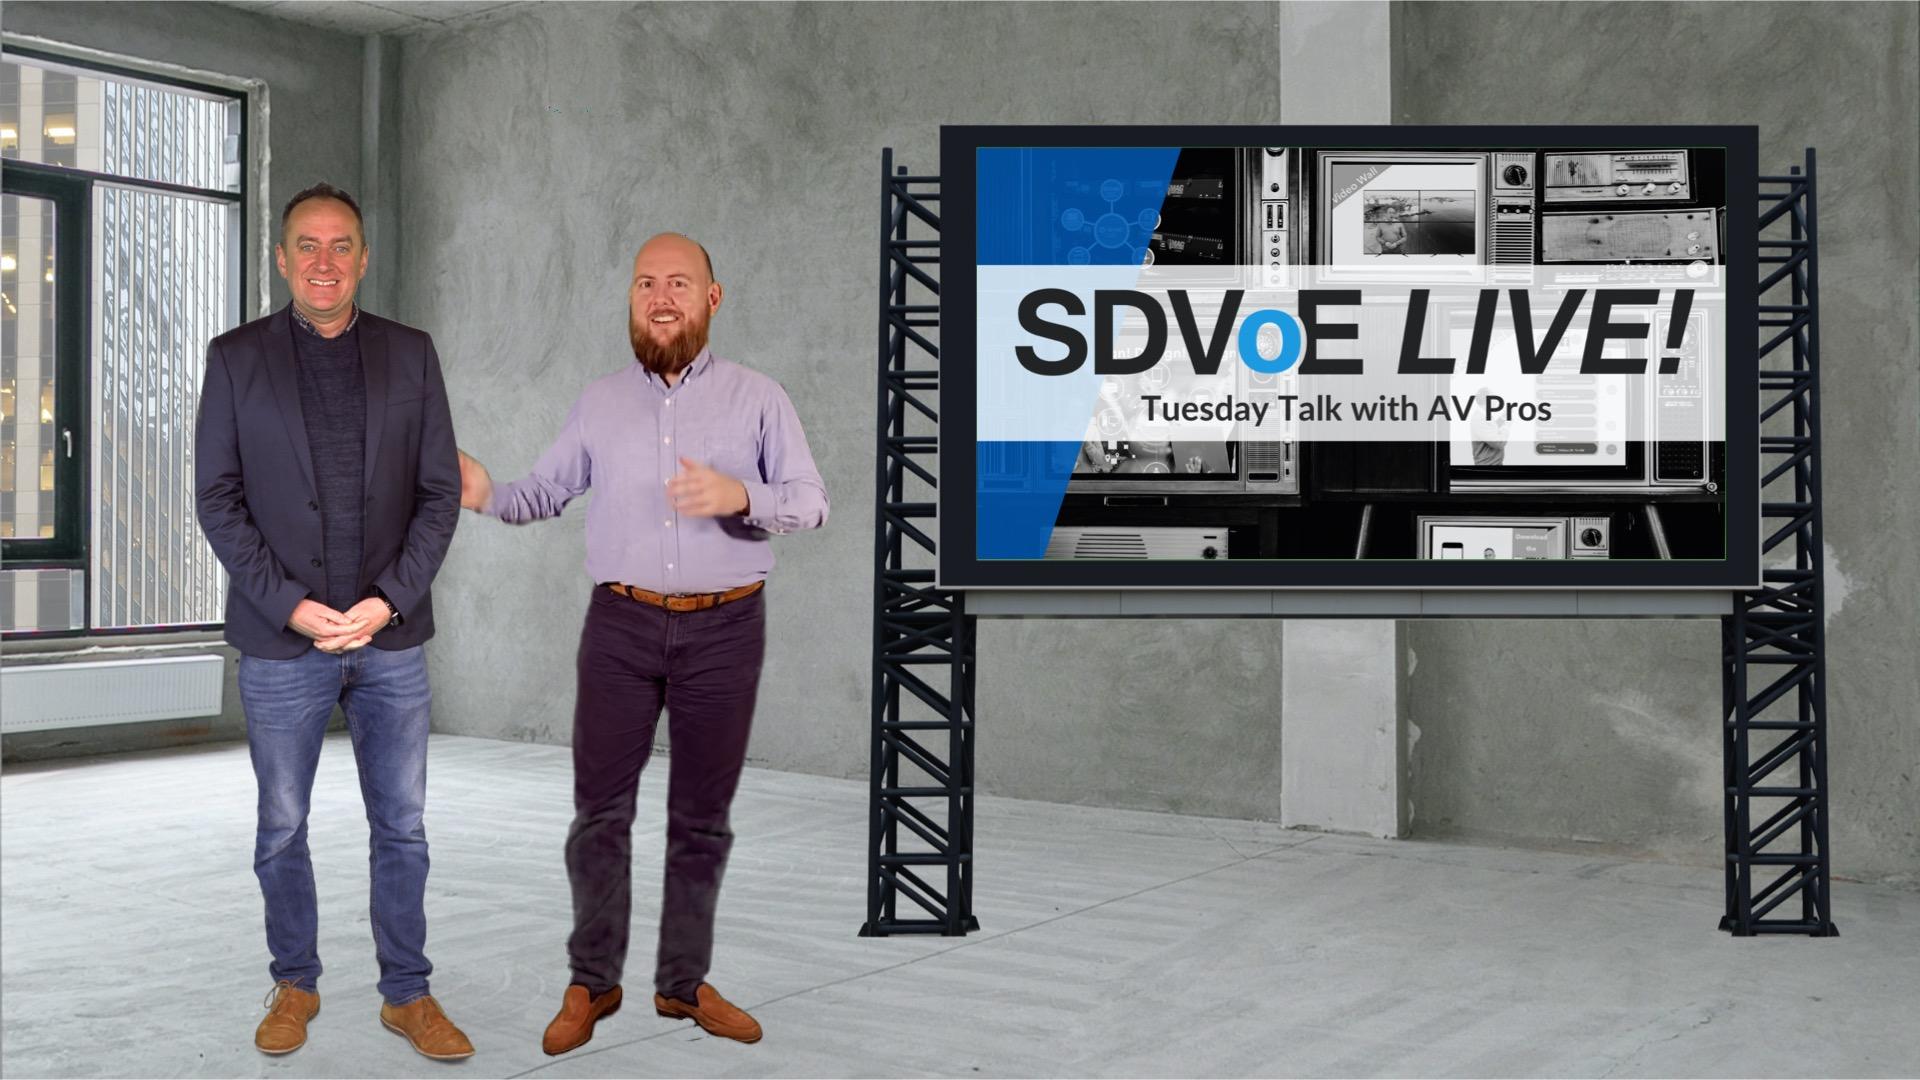 SDVoE LIVE! Episode 4: HDR Explained